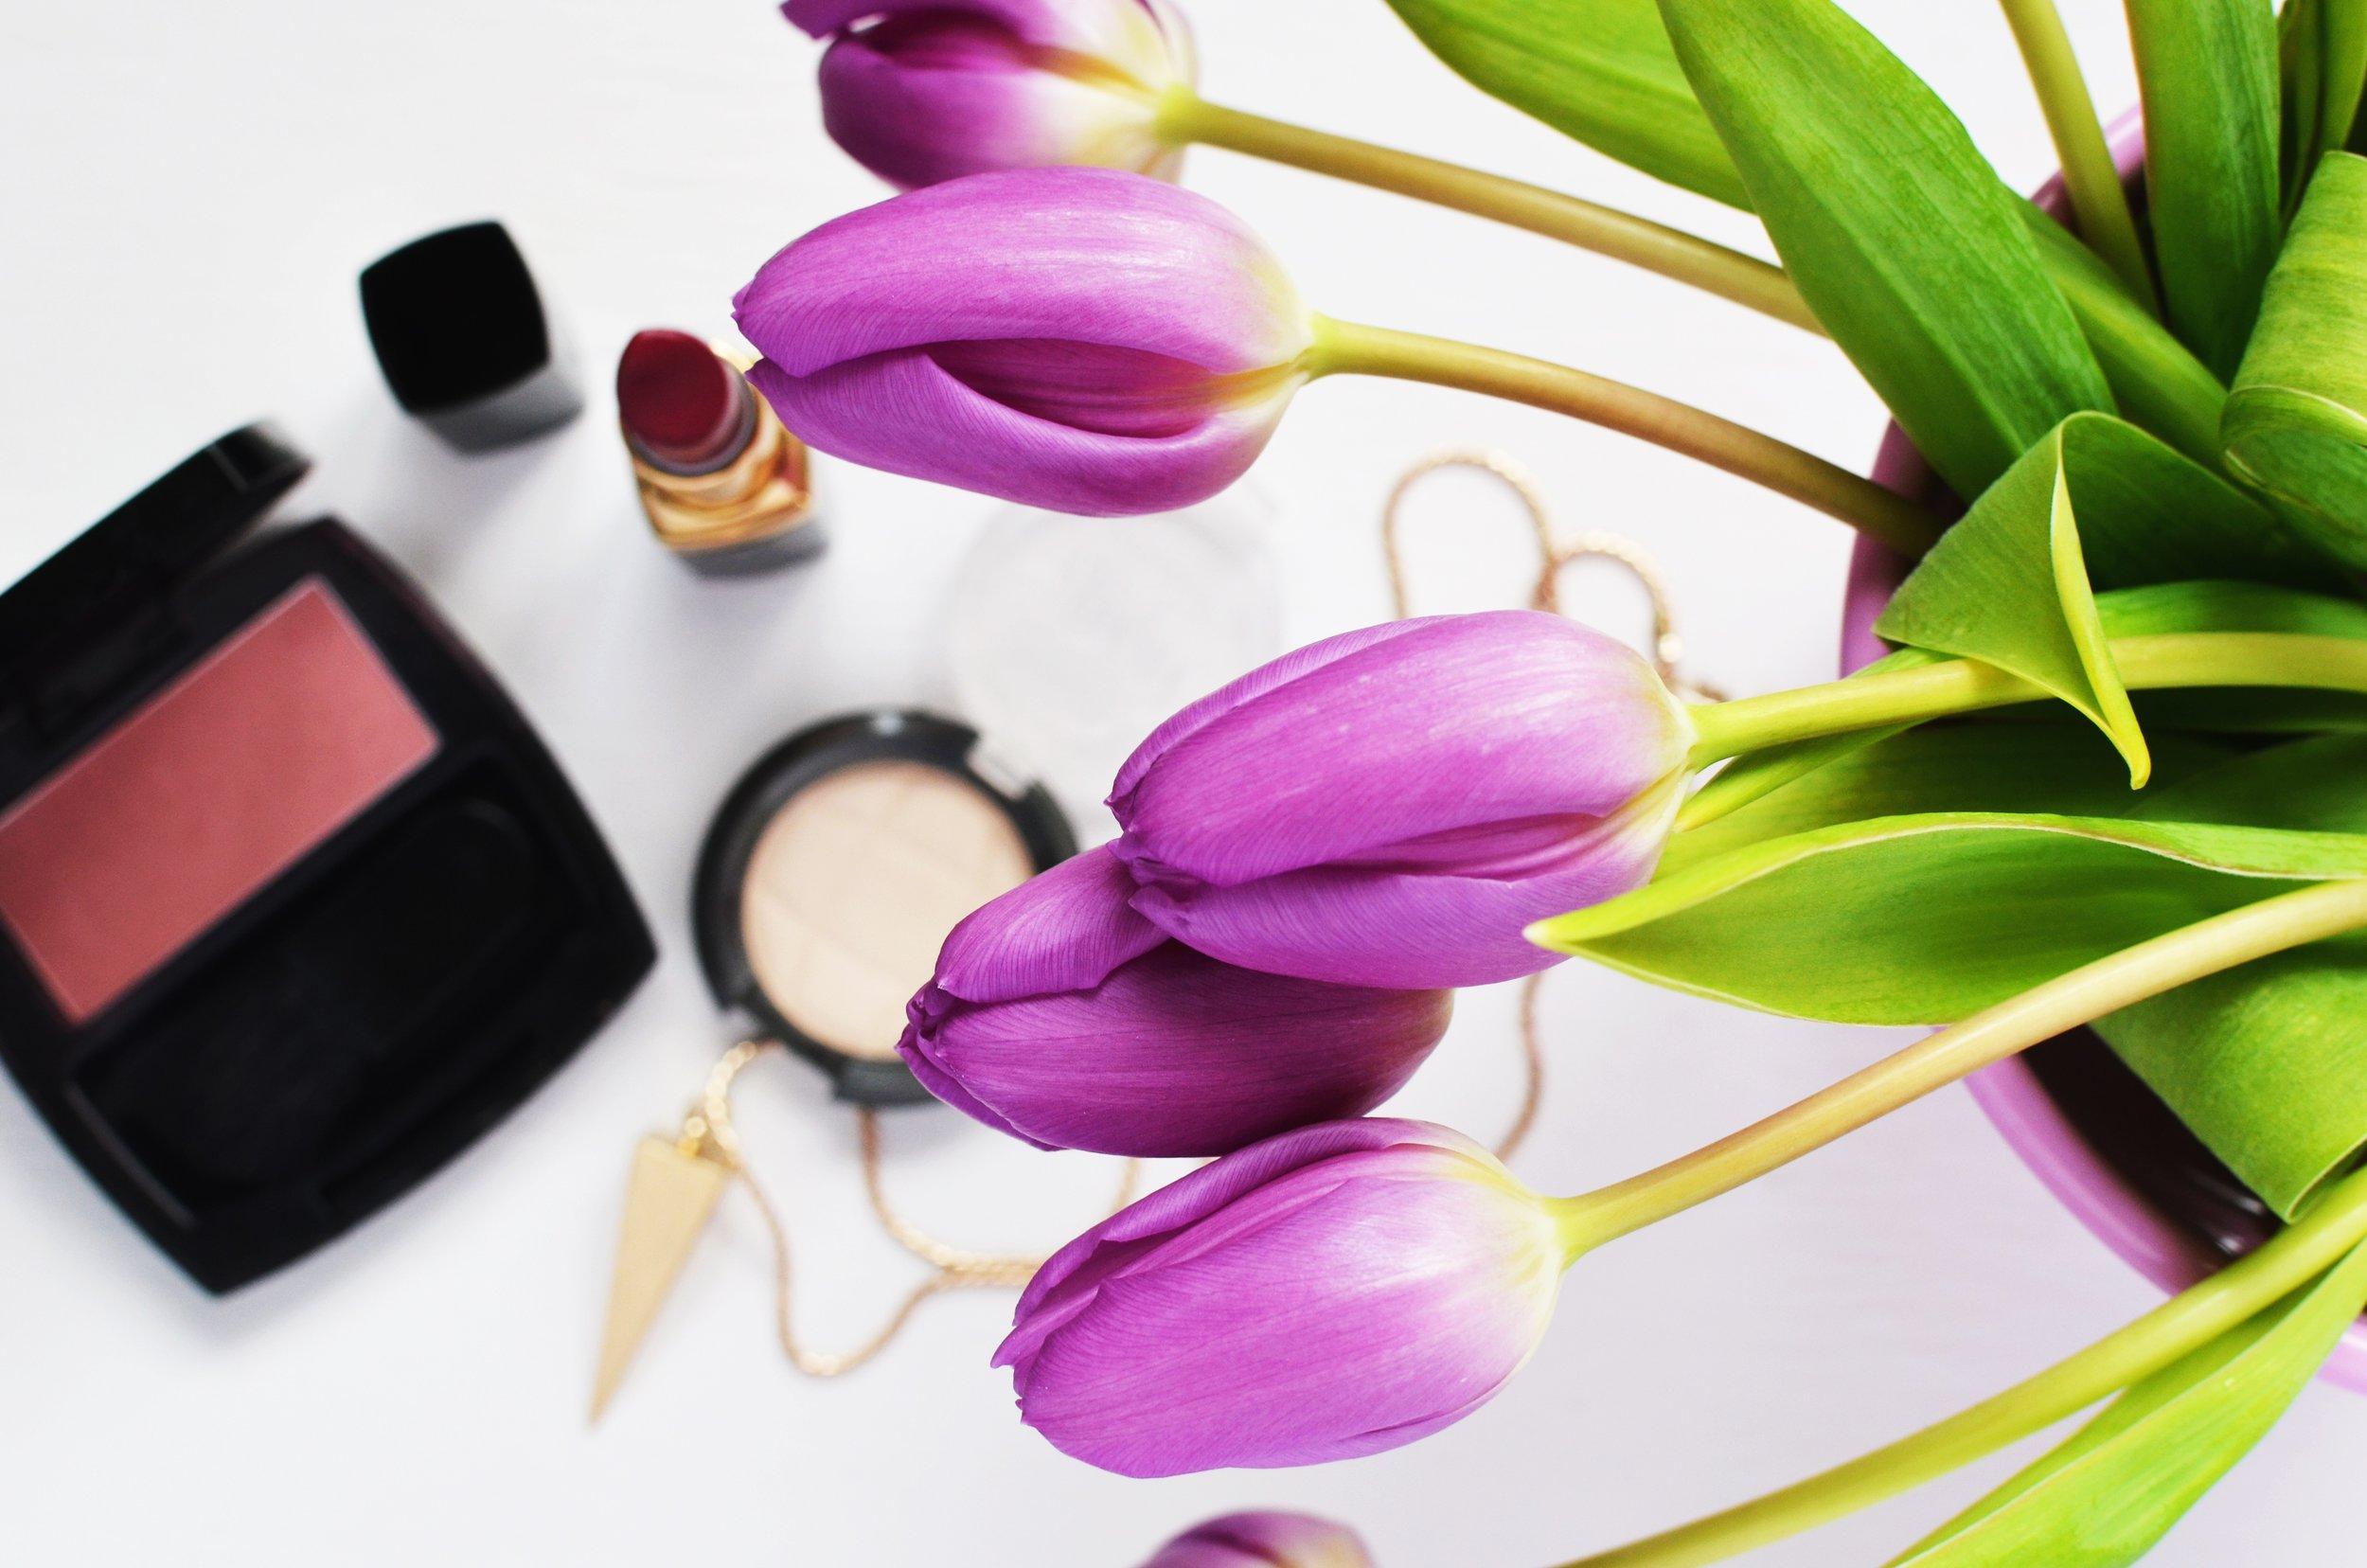 uwm.guide.plant-flower-petal-color-pink-make-up-542736-pxhere.com